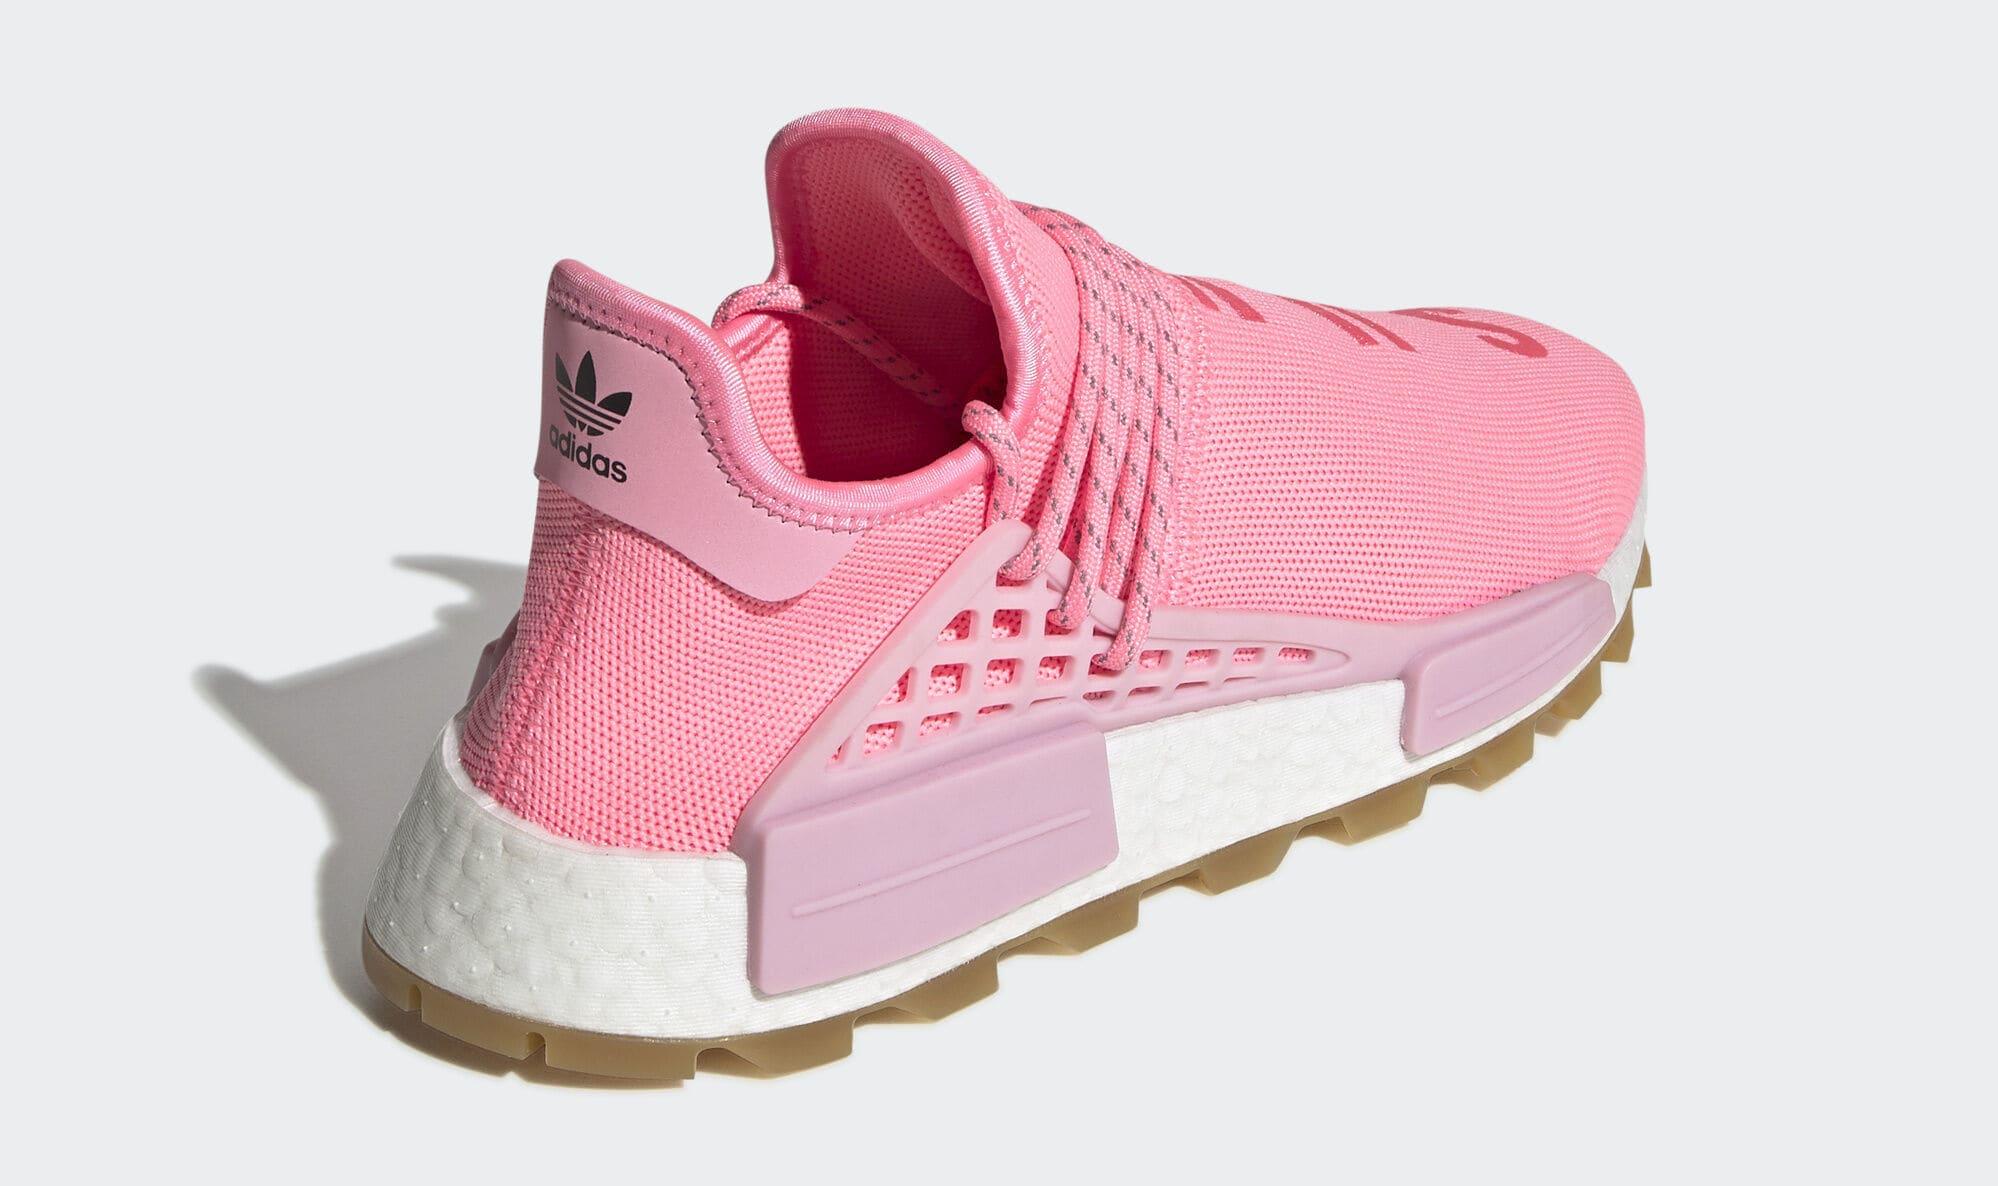 Pharrell x Adidas NMD Hu 'Gum' EG7740 (Heel)